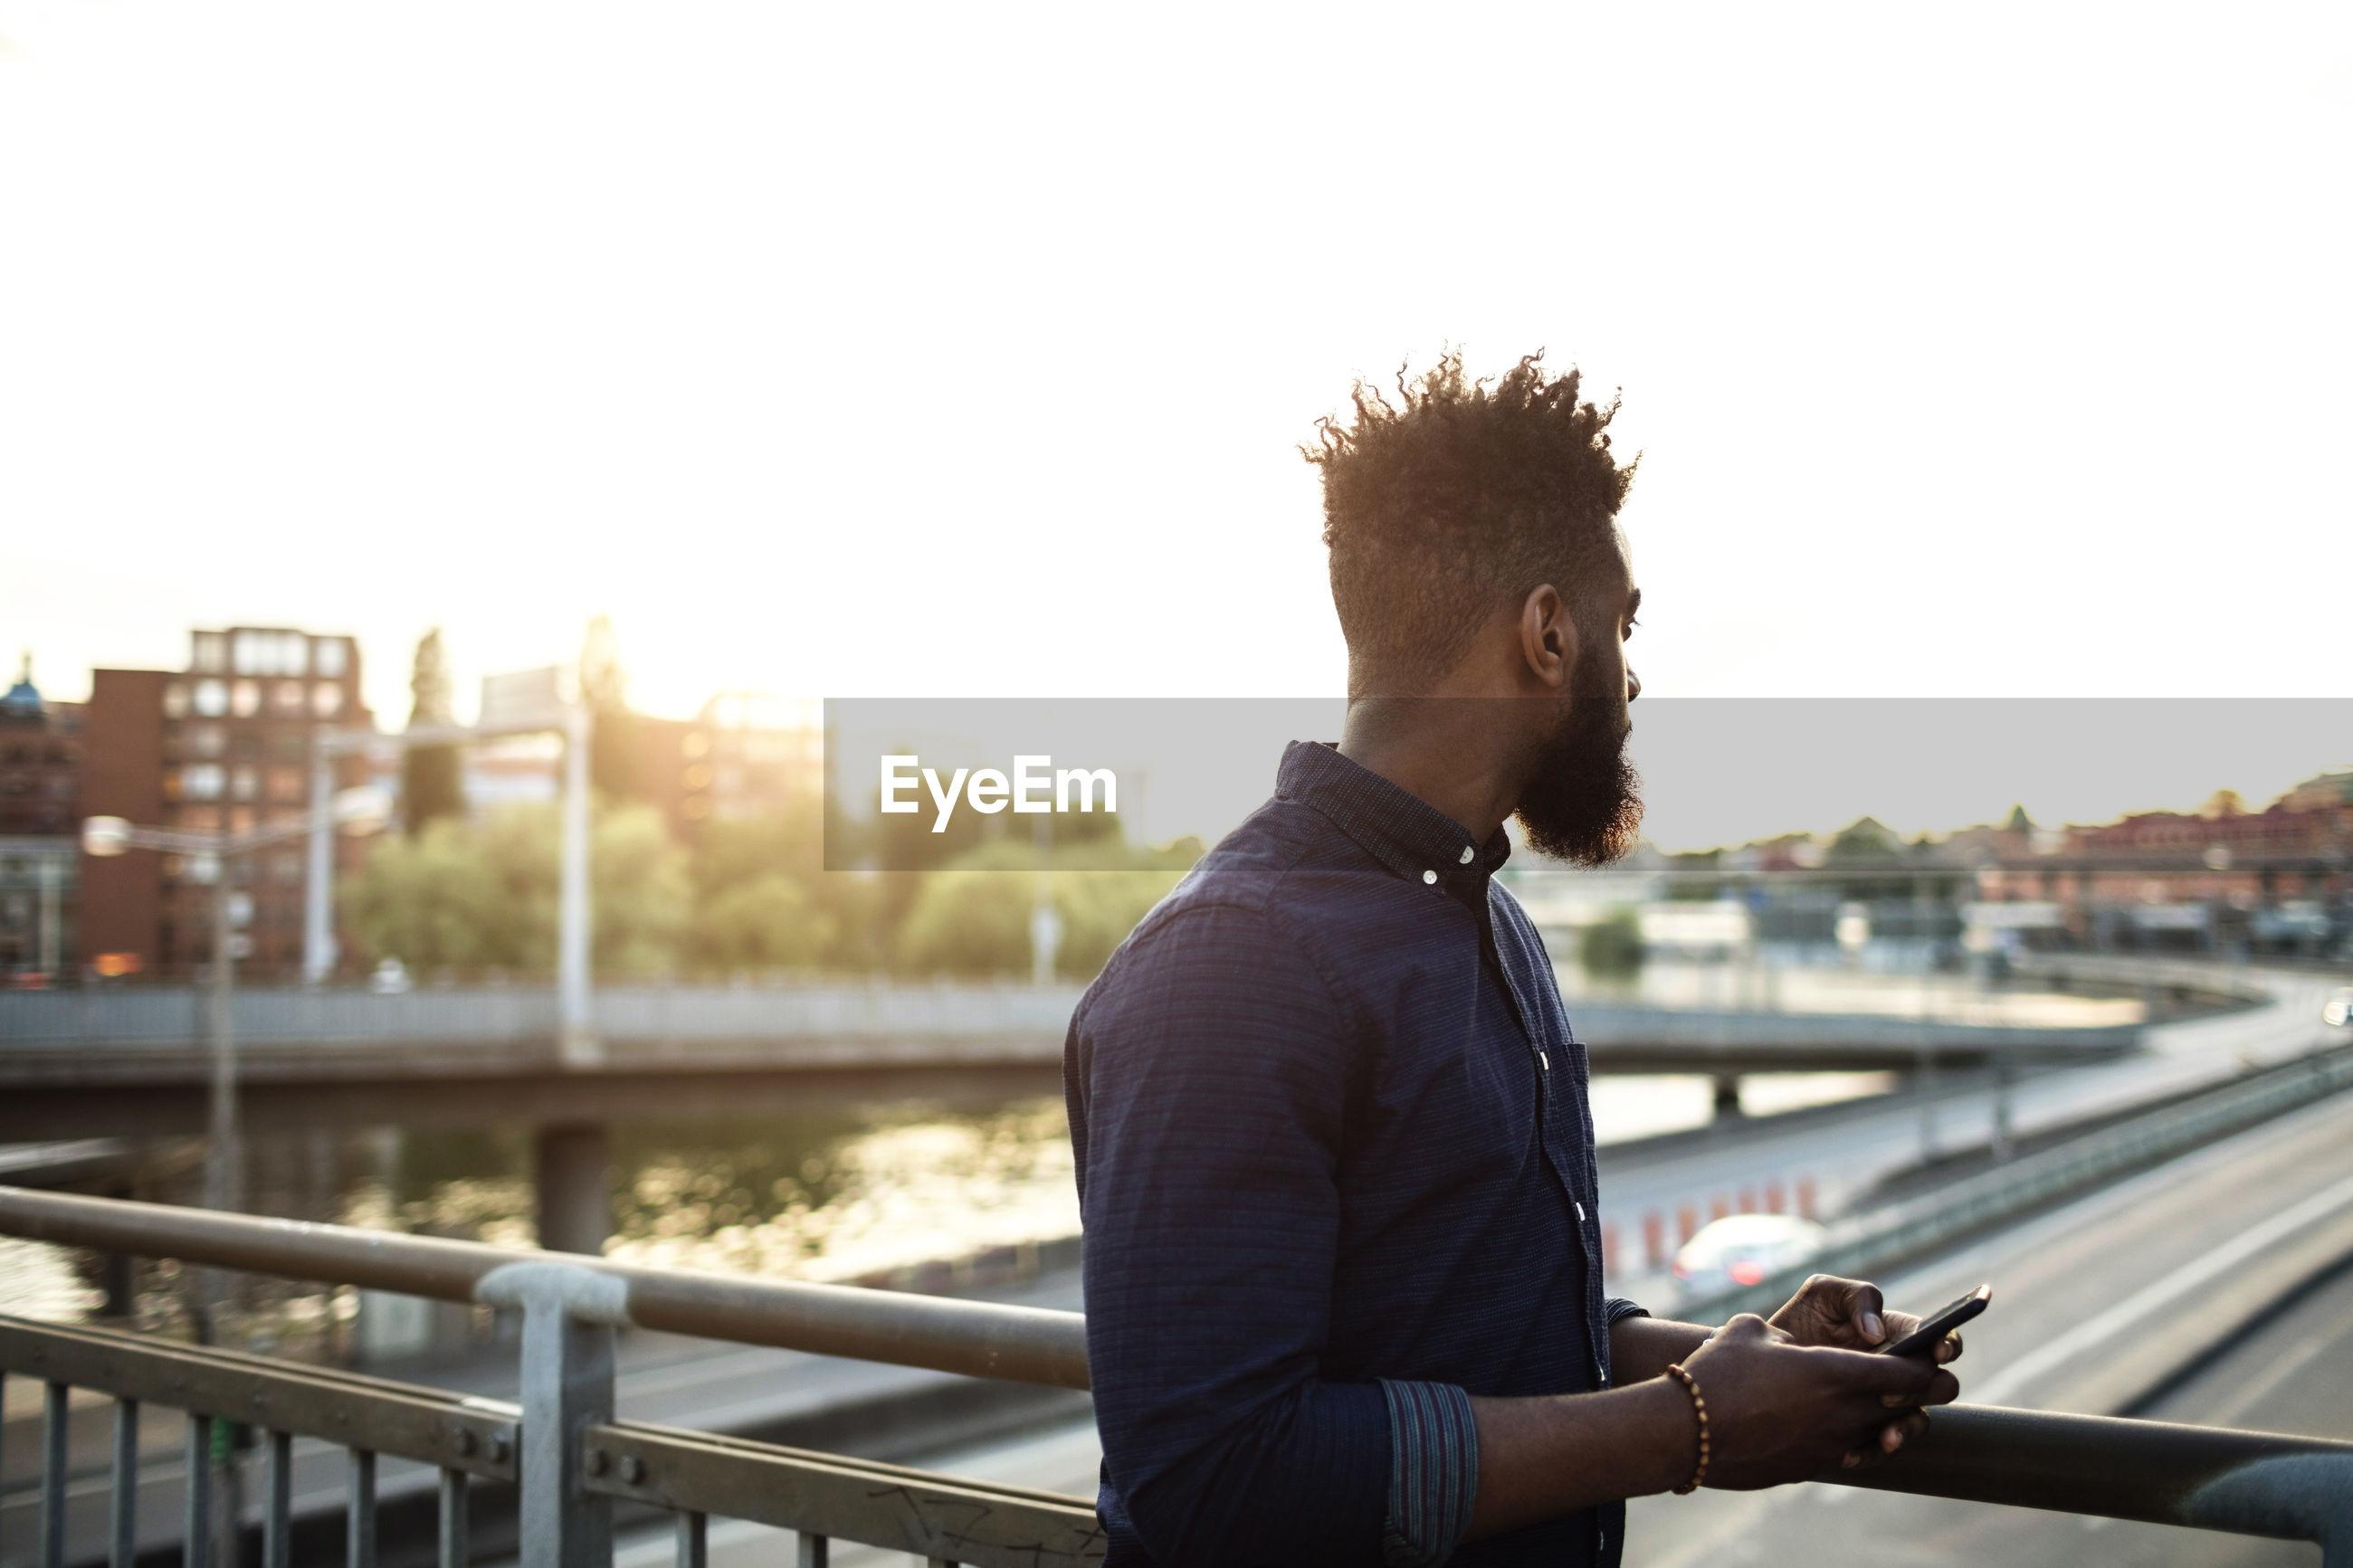 YOUNG MAN LOOKING AT CITY VIEW